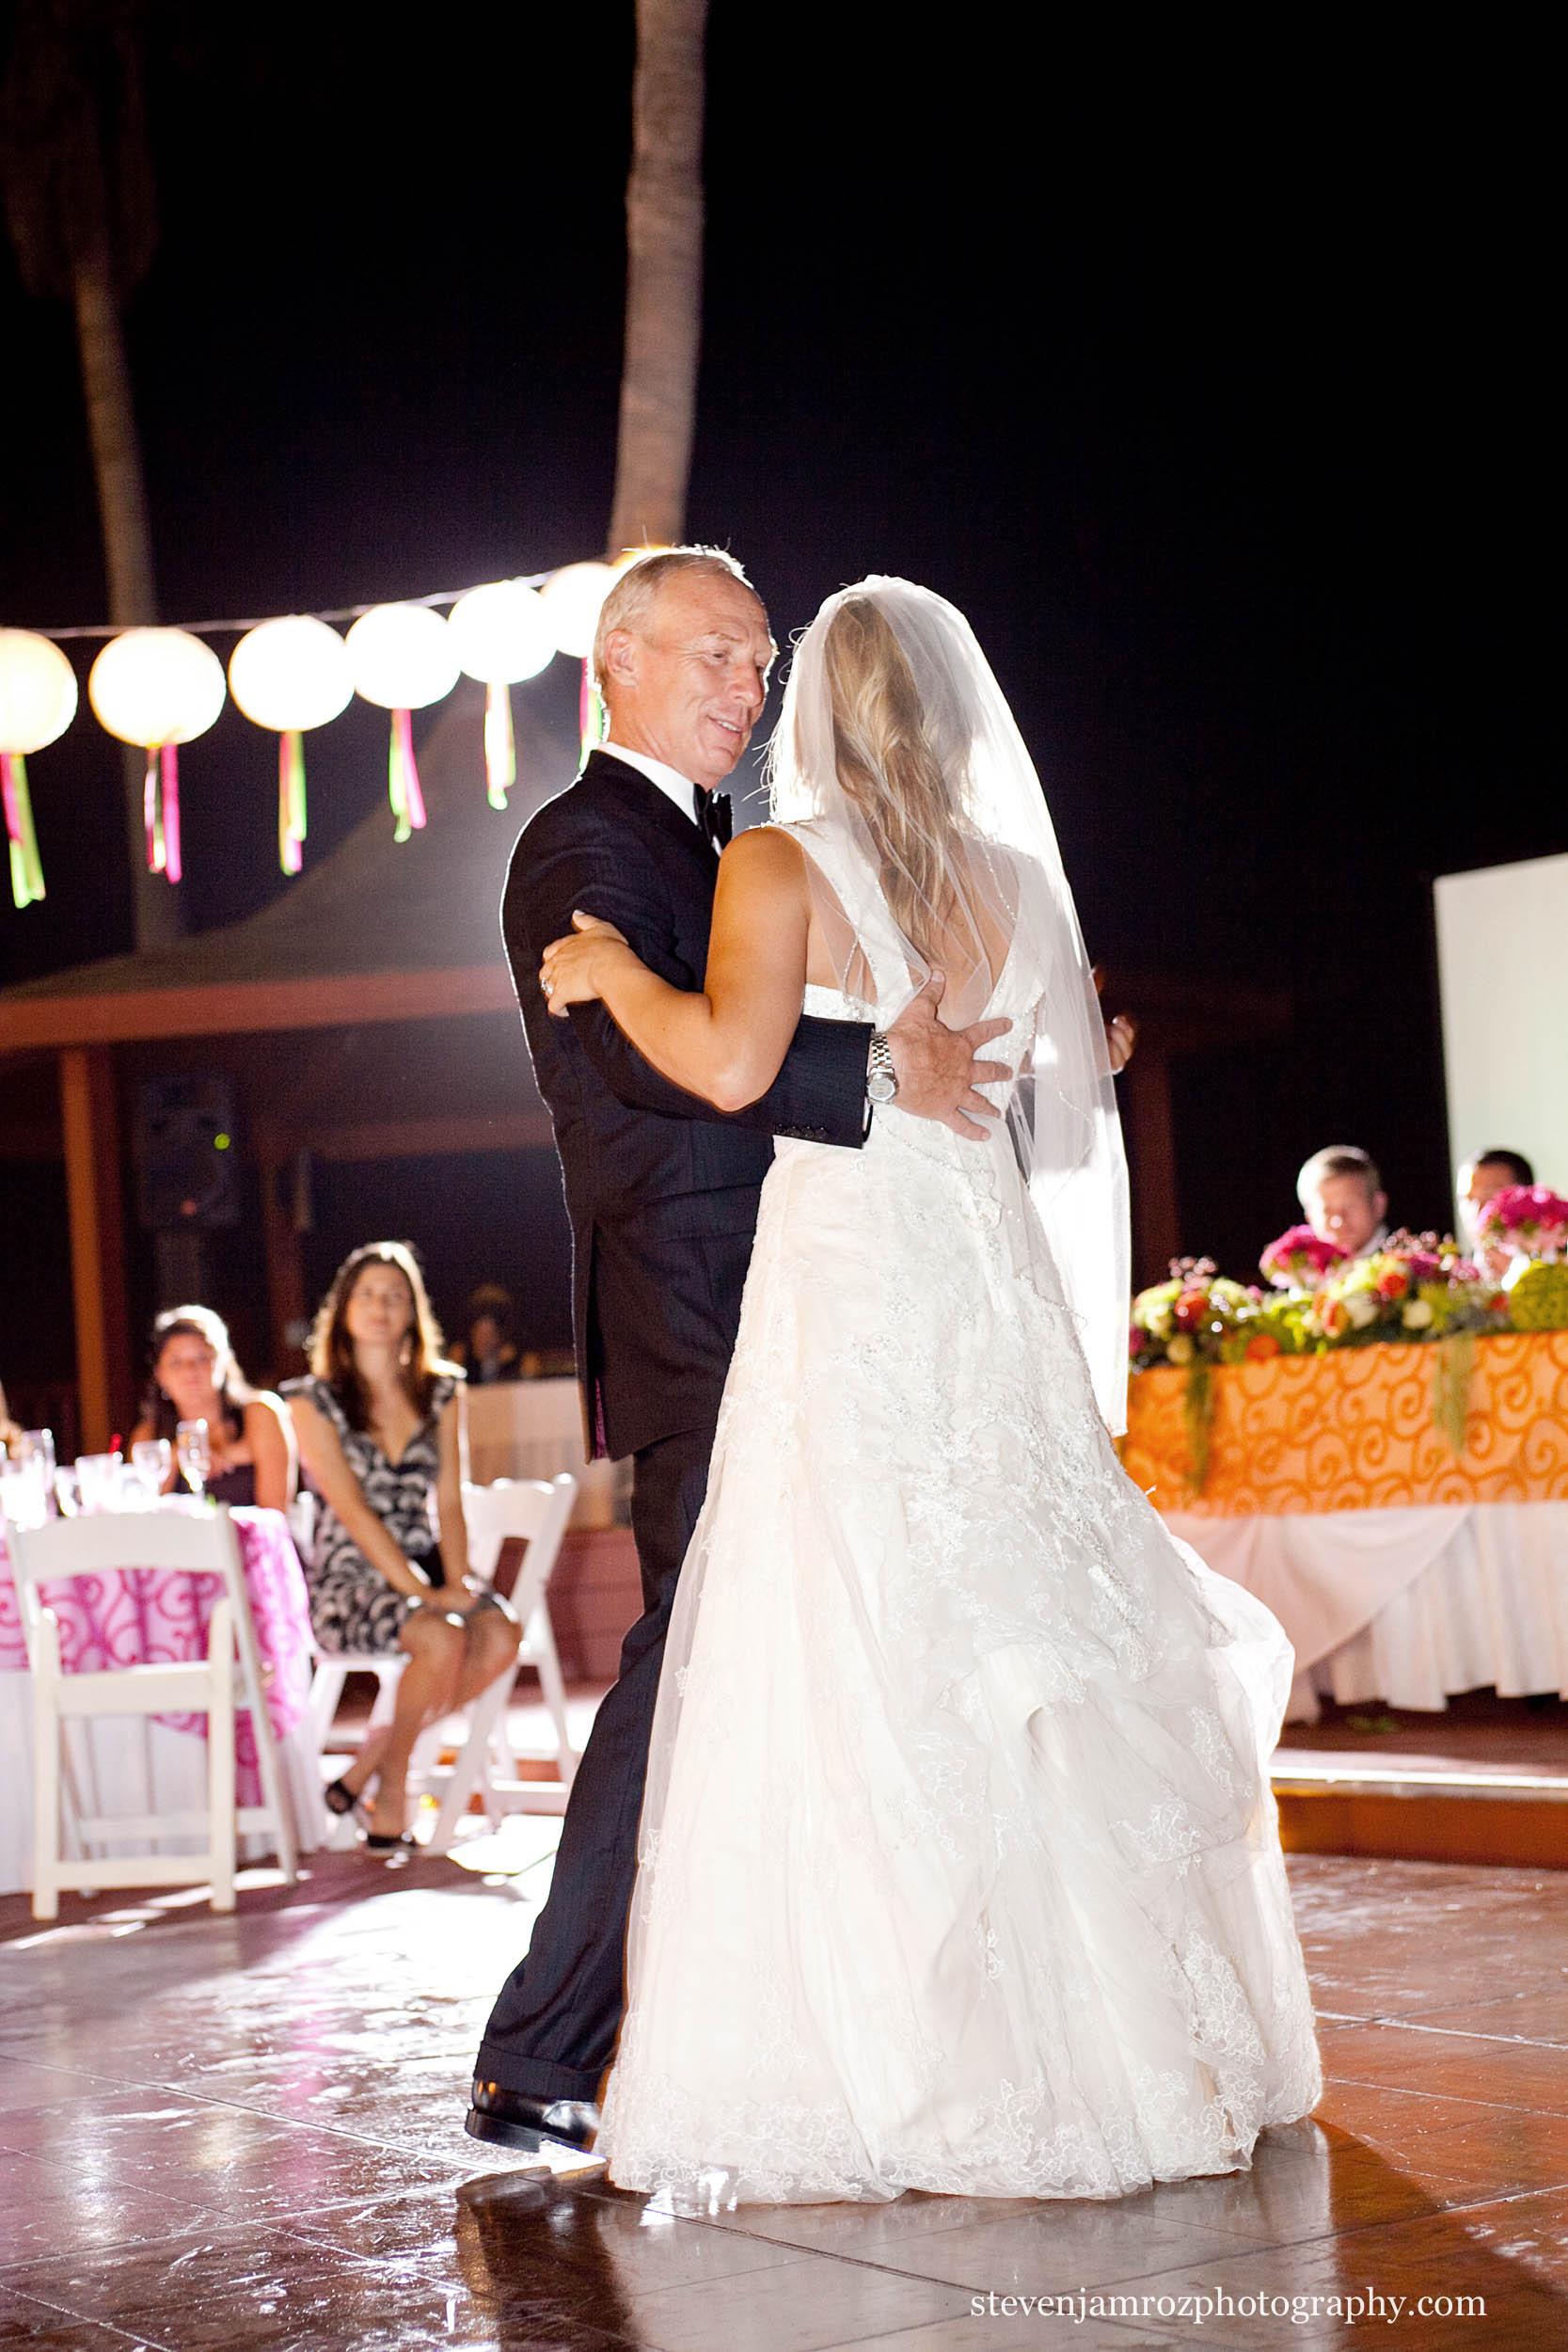 first-dance-father-daughter-wedding-durham-nc-steven-jamroz-0758.jpg